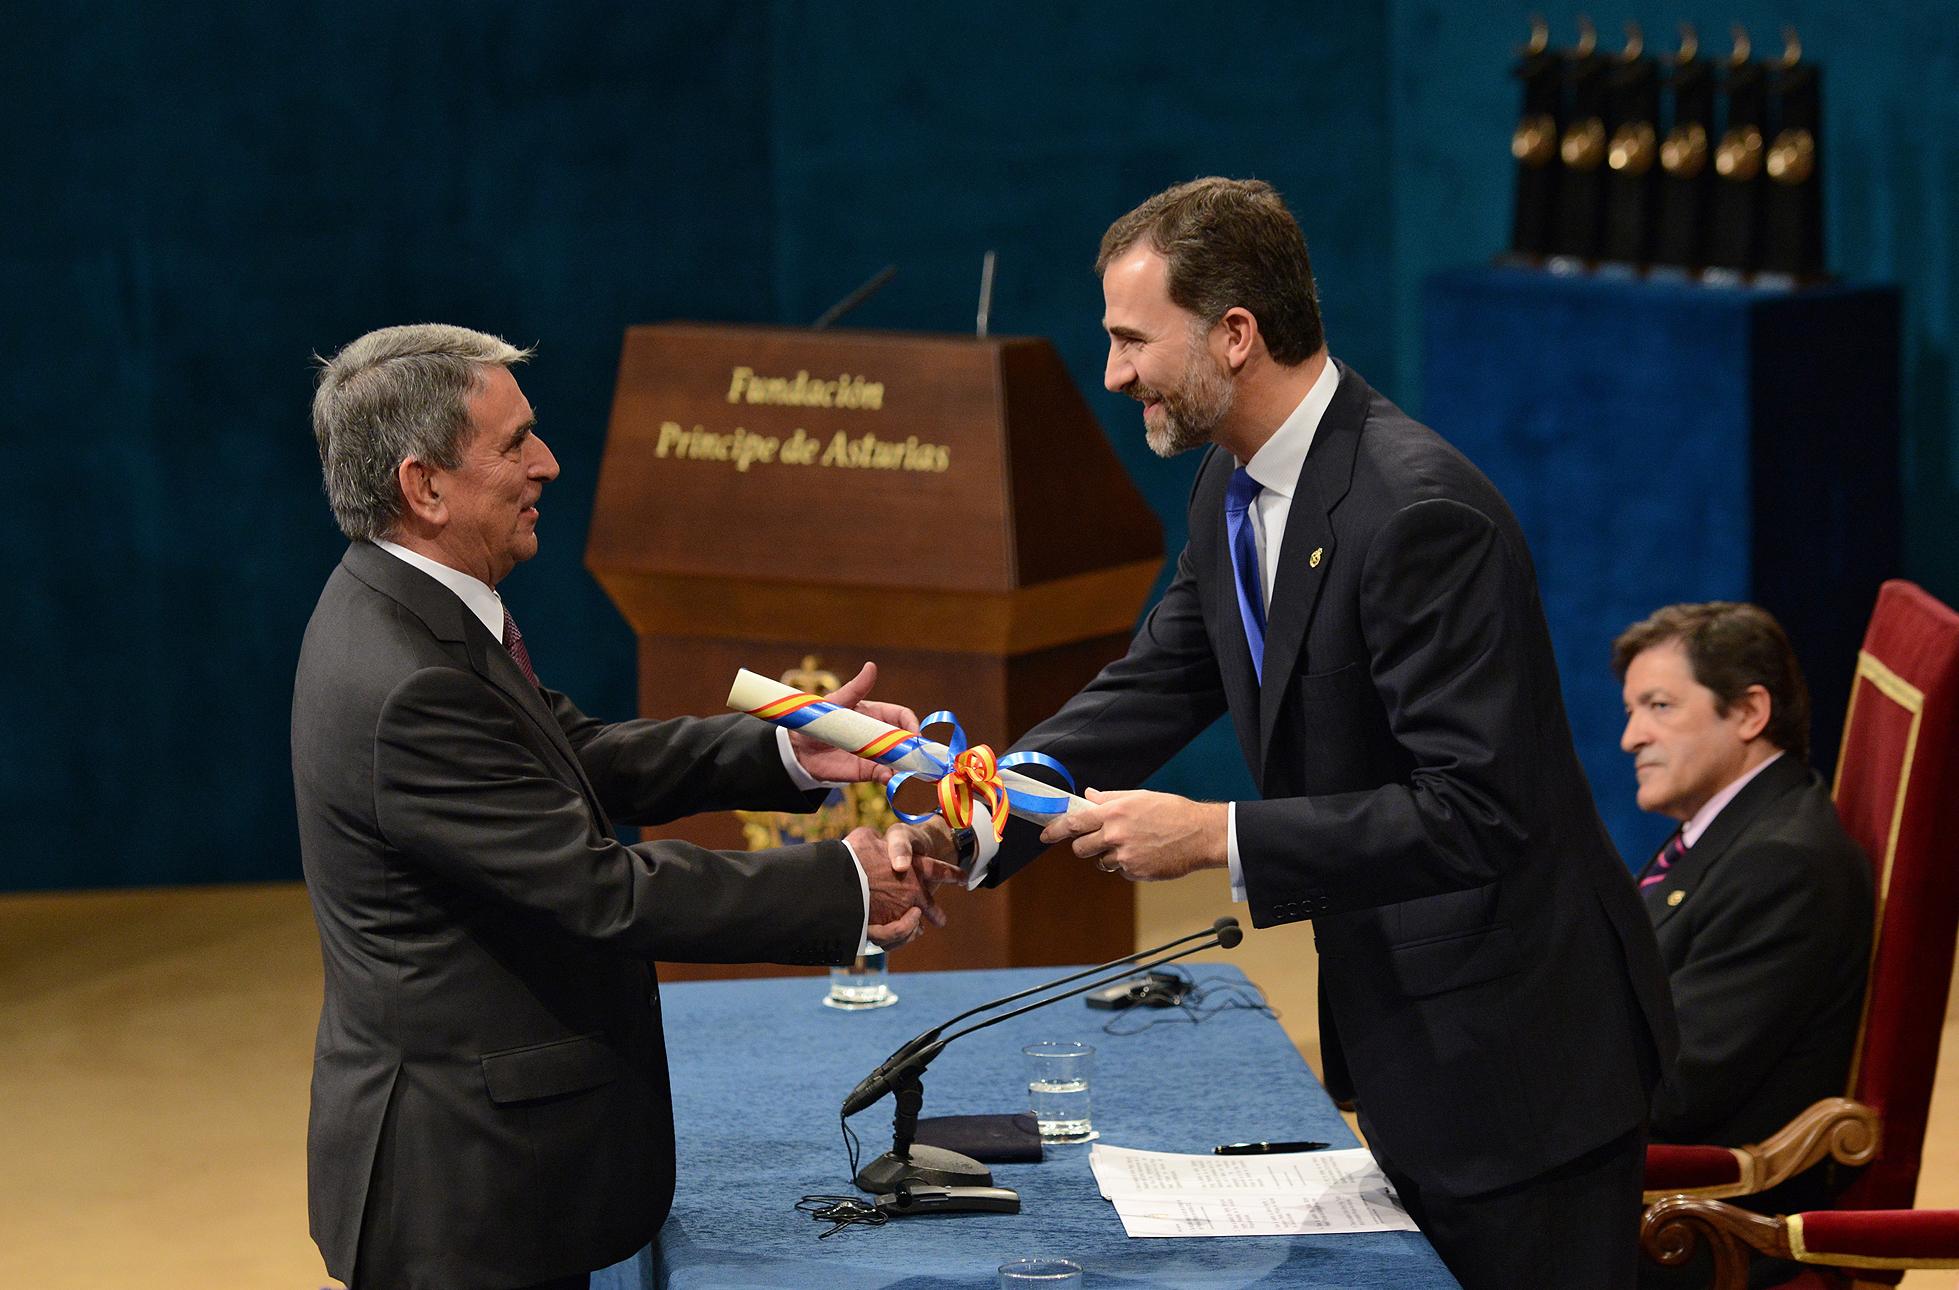 Archivo:Premio Principe de Asturias 2012.jpg - Wikipedia, la enciclopedia  libre